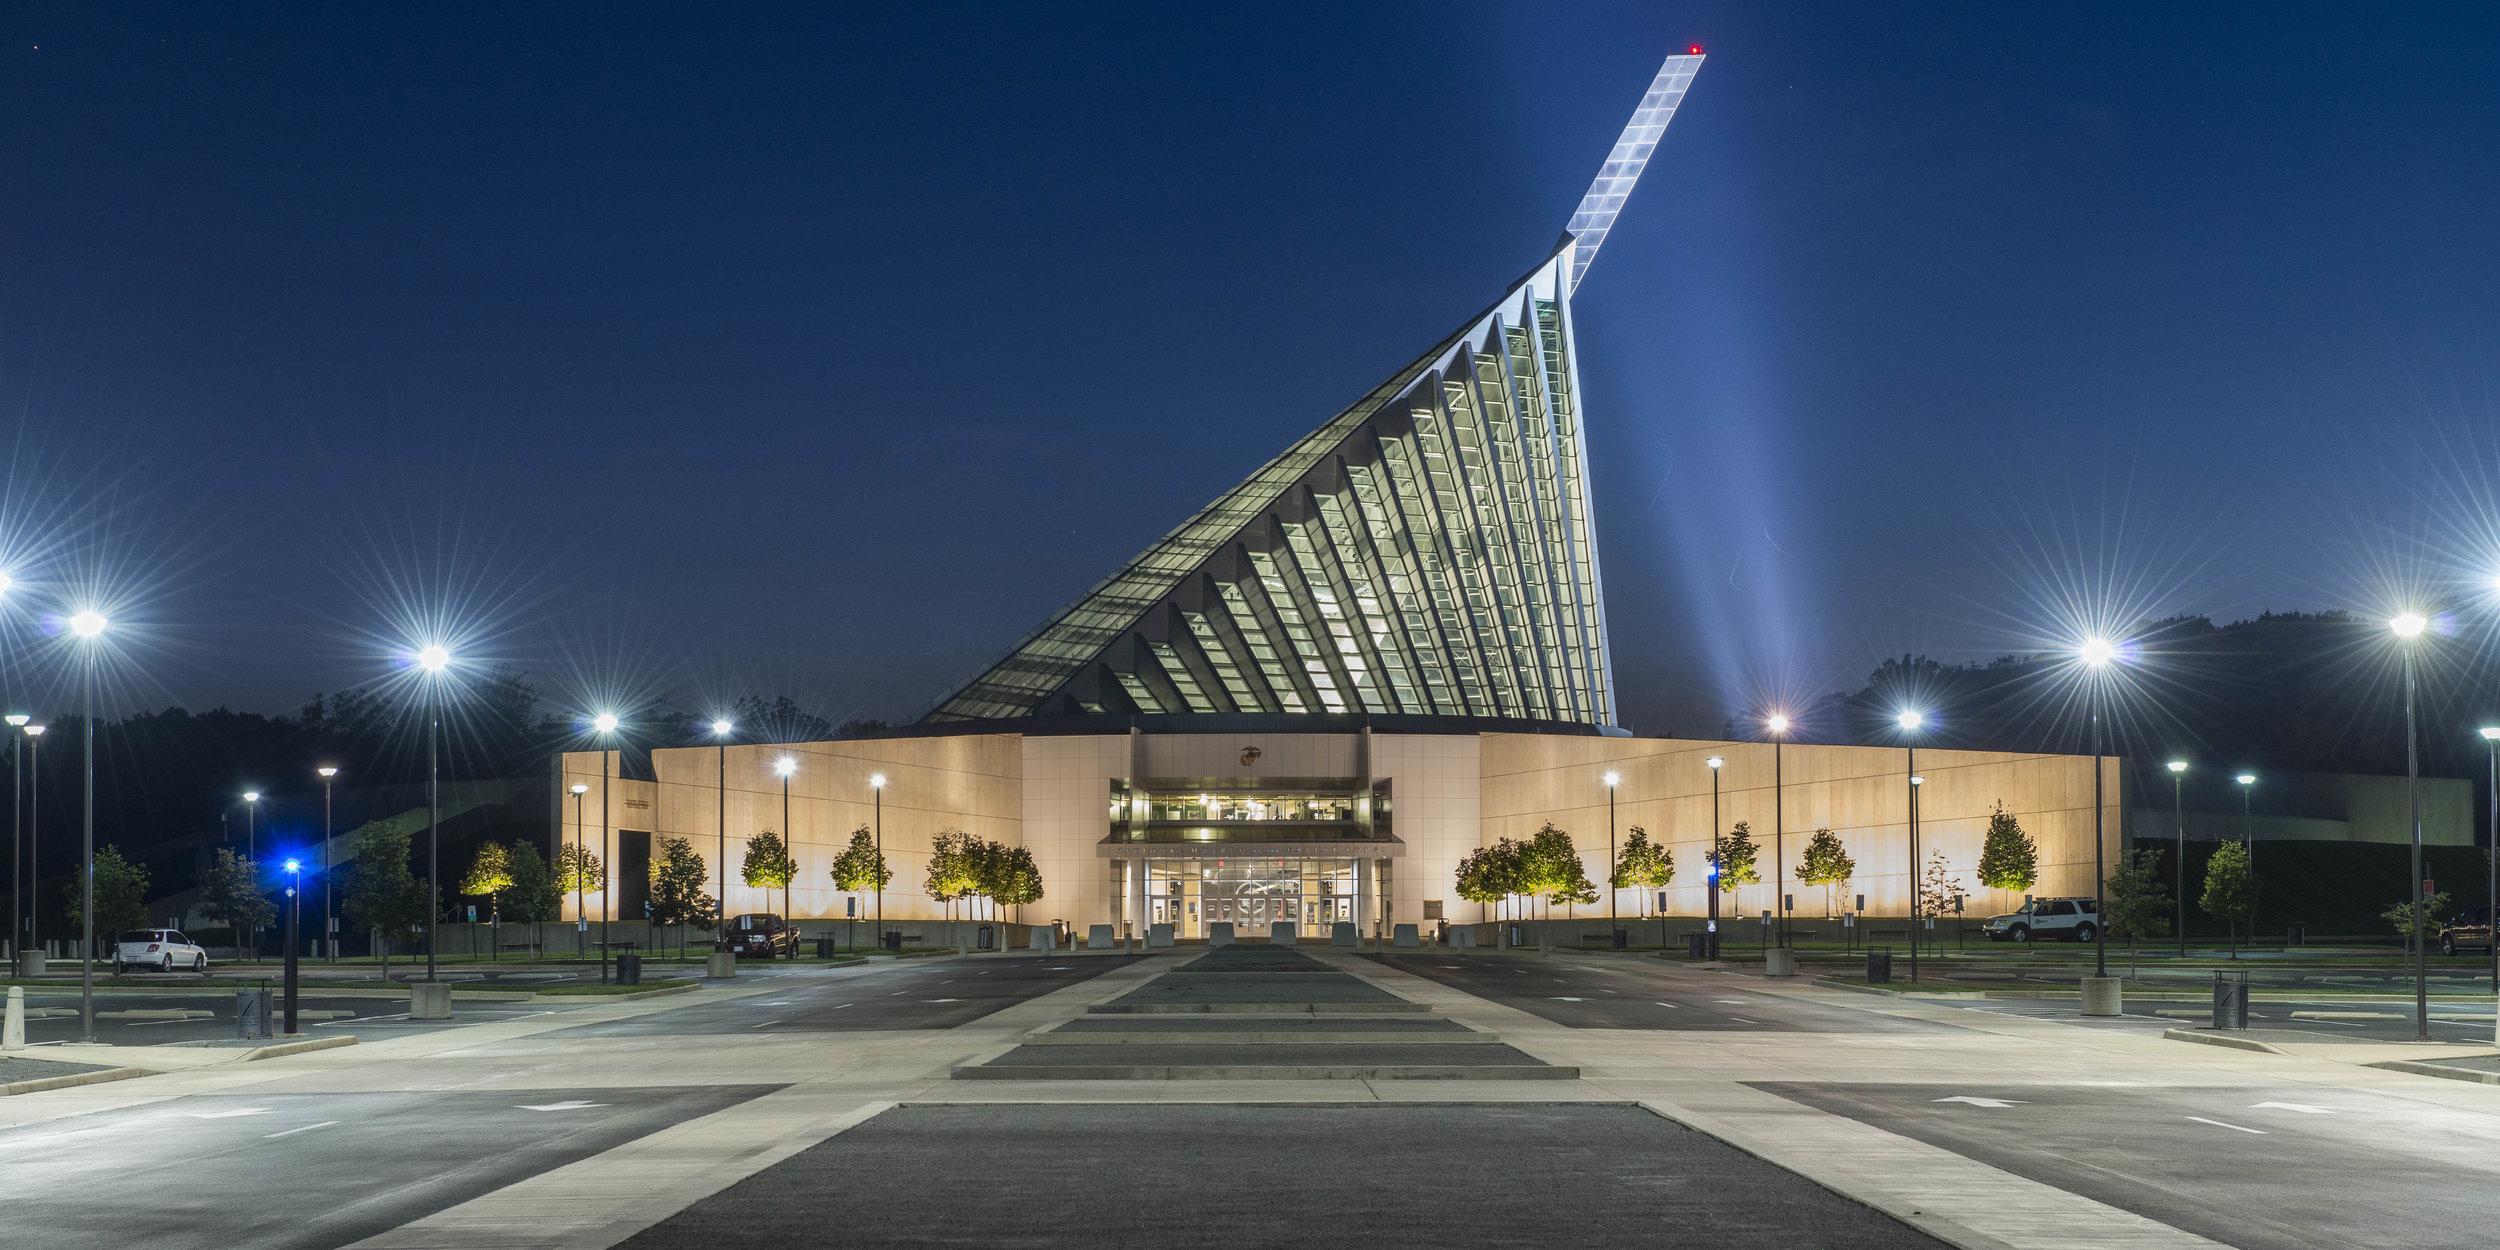 <f>Markets</f><f>Civic+Cultural</f><f>Services</f><f>Planning</f><f>Services</f><f>LandscapeArchitecture</f><t>National Museum of the Marine Corps</t><m>Quantico, VA</m>